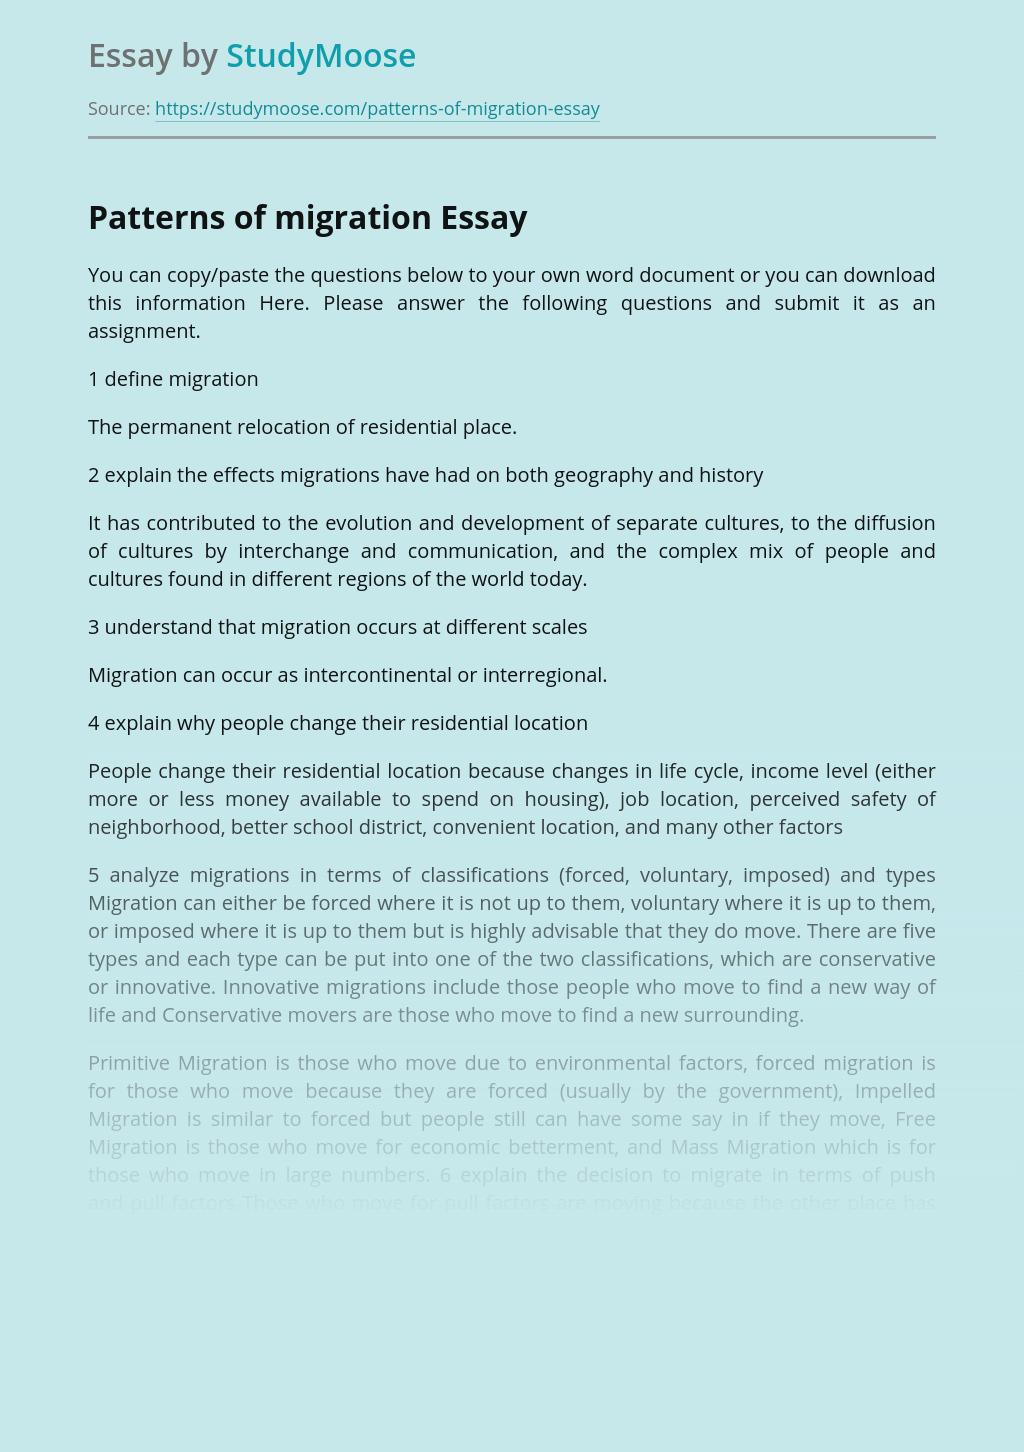 Patterns of migration